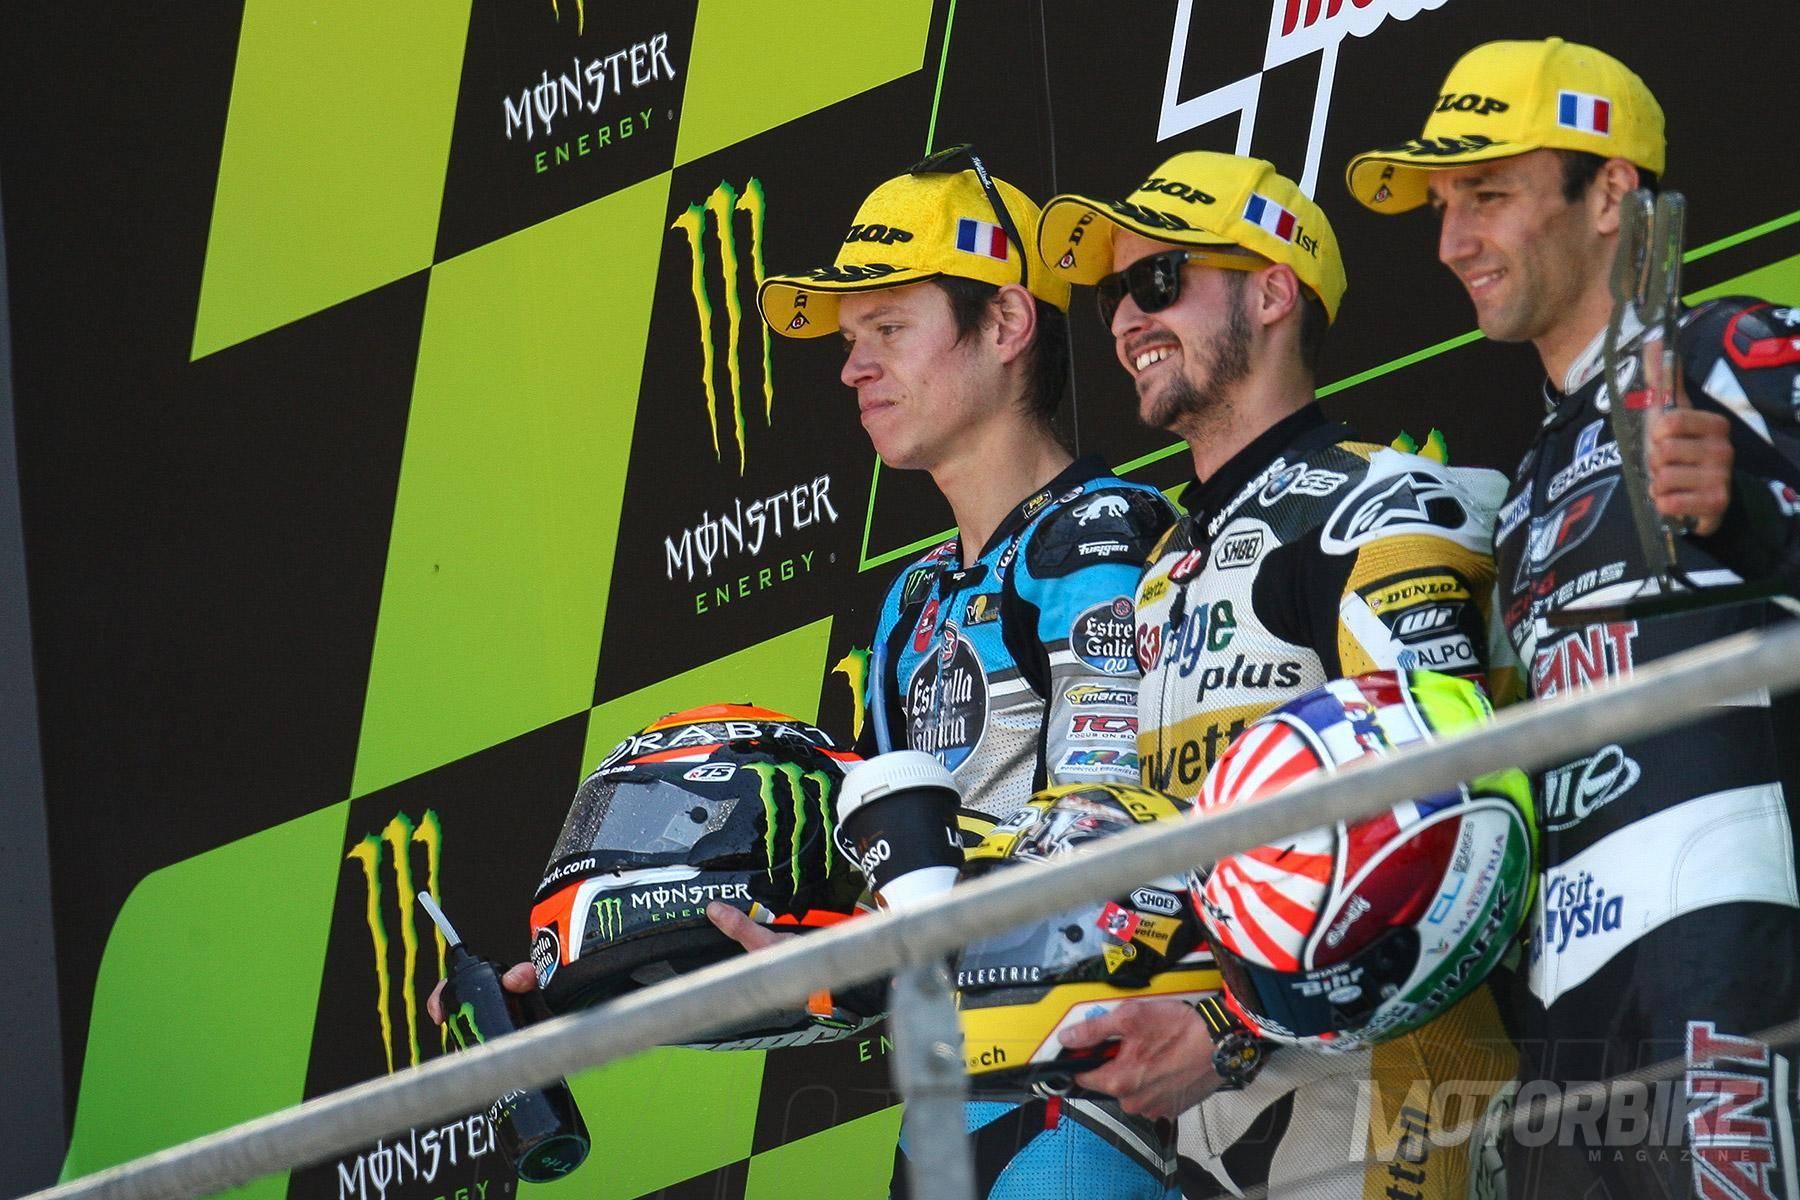 Moto2 Francia 2015 - Motorbike Magazine